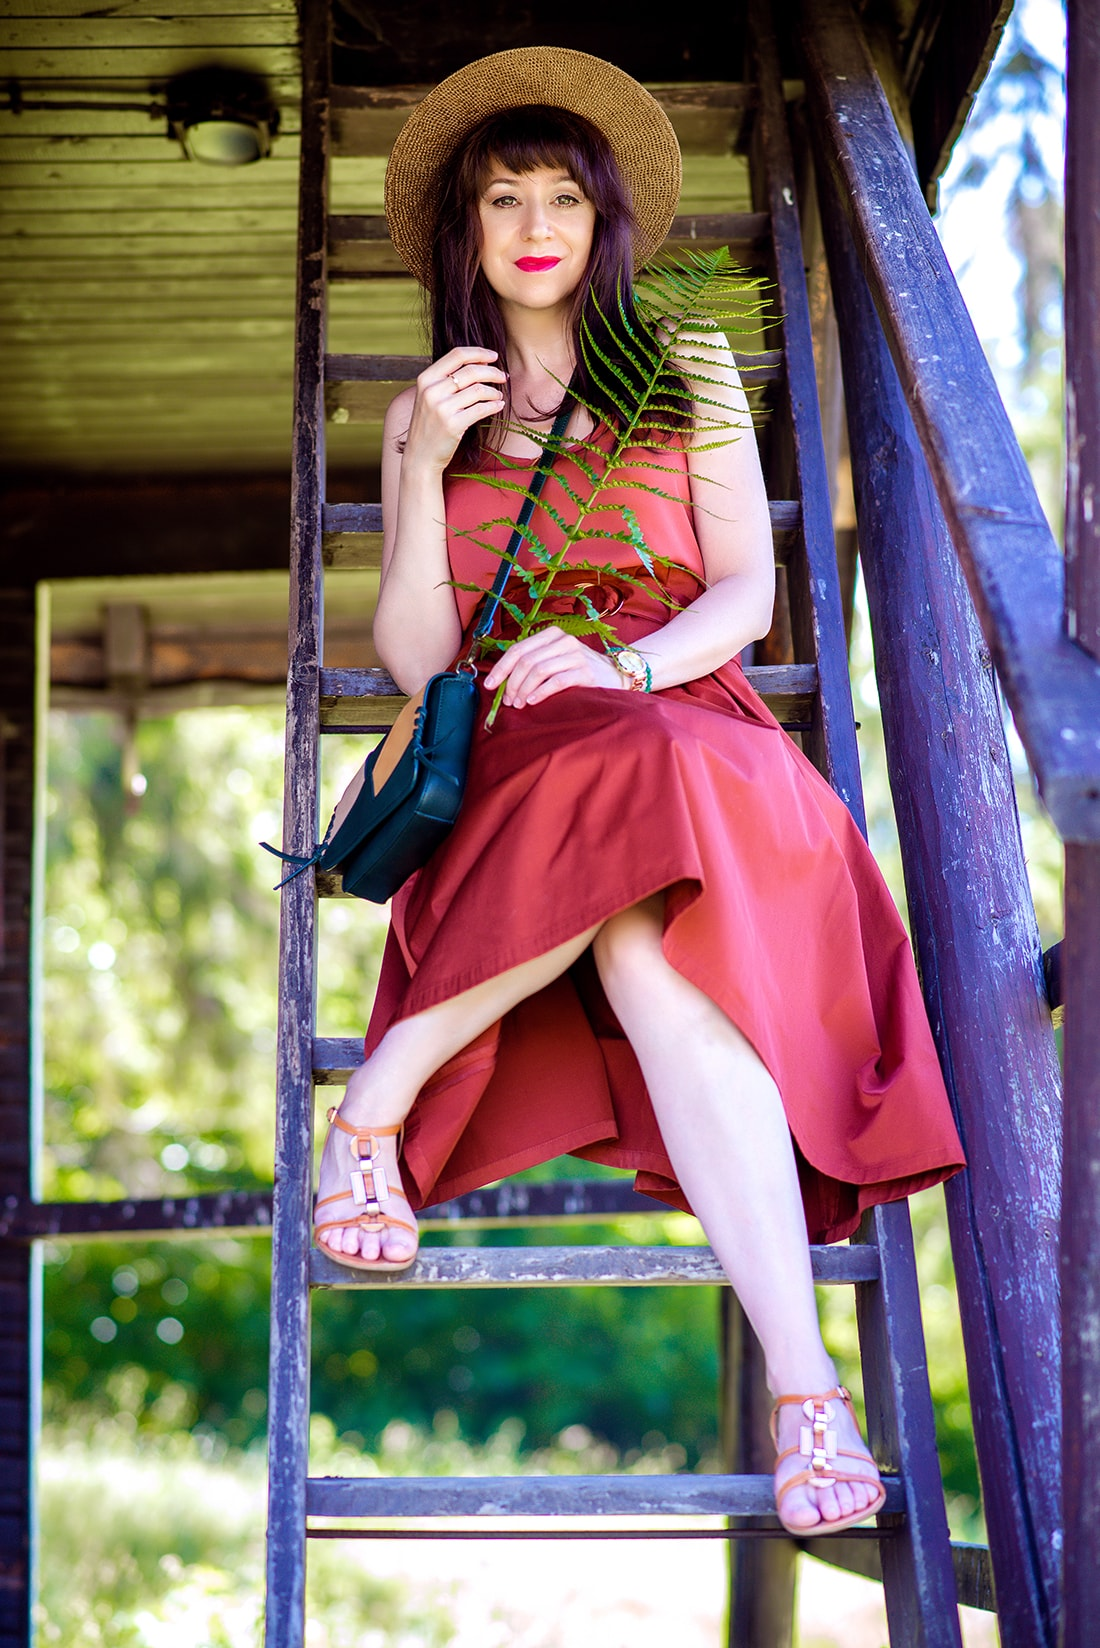 KEĎ KLOBÚK LADÍ S KABELKOU_Katharine-fashion is beautiful_blog 11_Slamený klobúk Parfois_Áčková sukňa Zara_Kabelka Parfois_Katarína Jakubčová_Fashion blogger